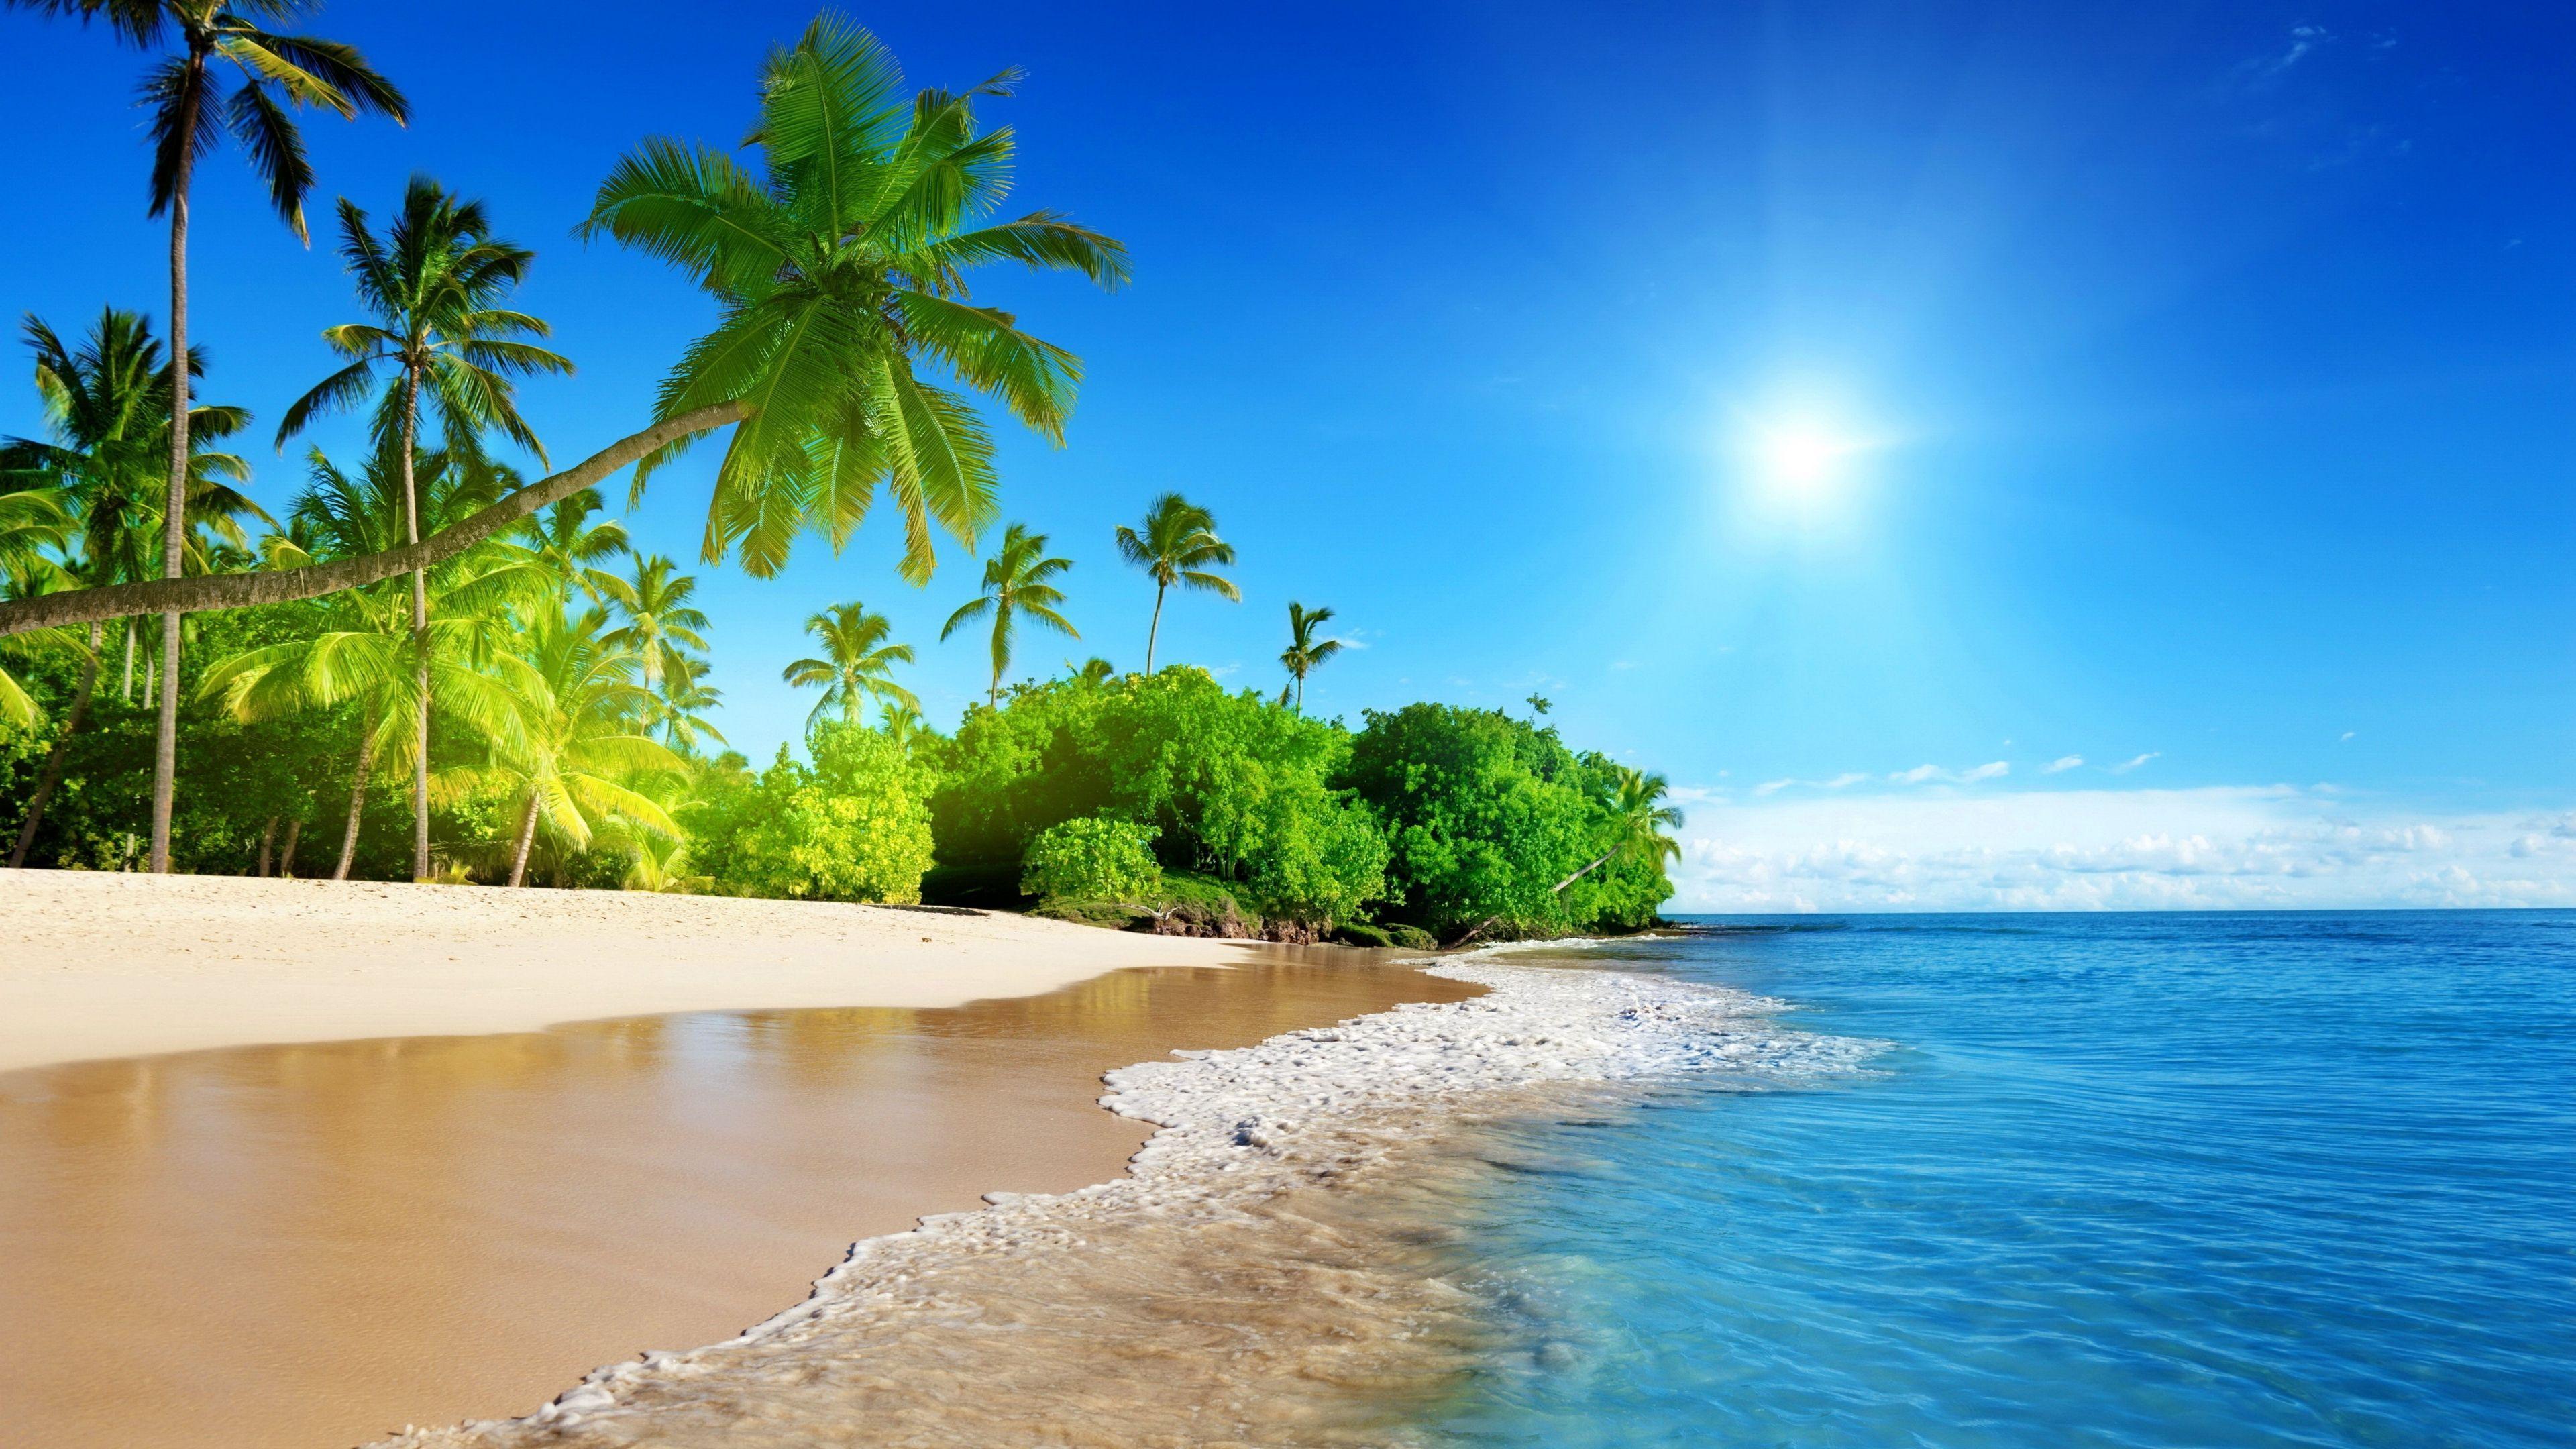 22 64k Ultra Hd Wallpaper 15360x8640 Download 2k Elegant Img Nature Beach Beach Wallpaper Beach